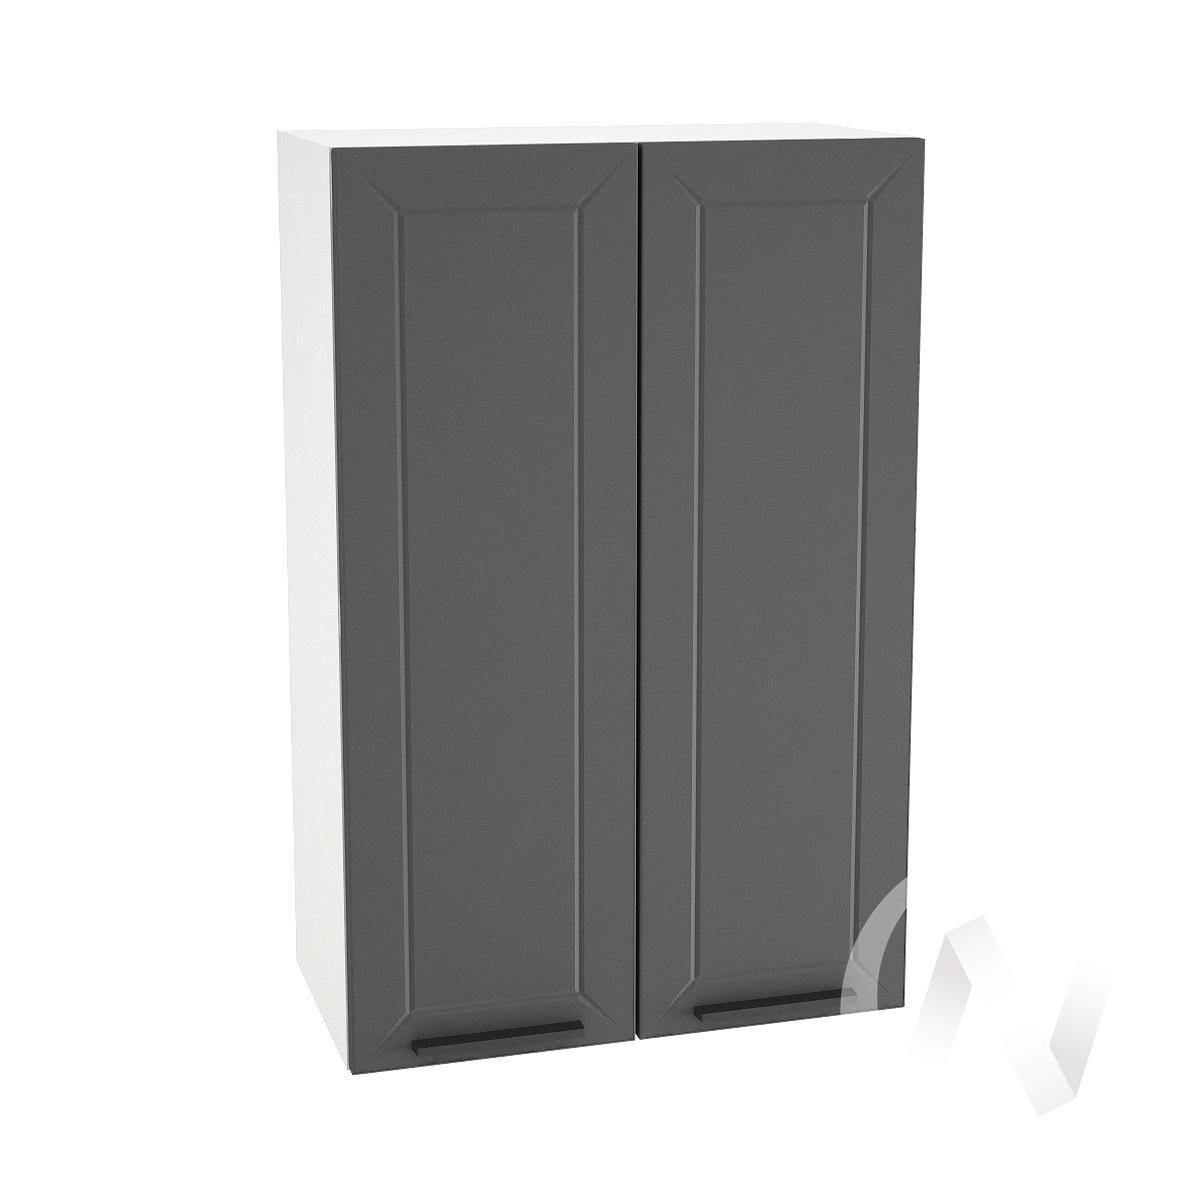 "Кухня ""Глетчер"": Шкаф верхний 609, ШВ 609 (Маренго силк/корпус белый)"